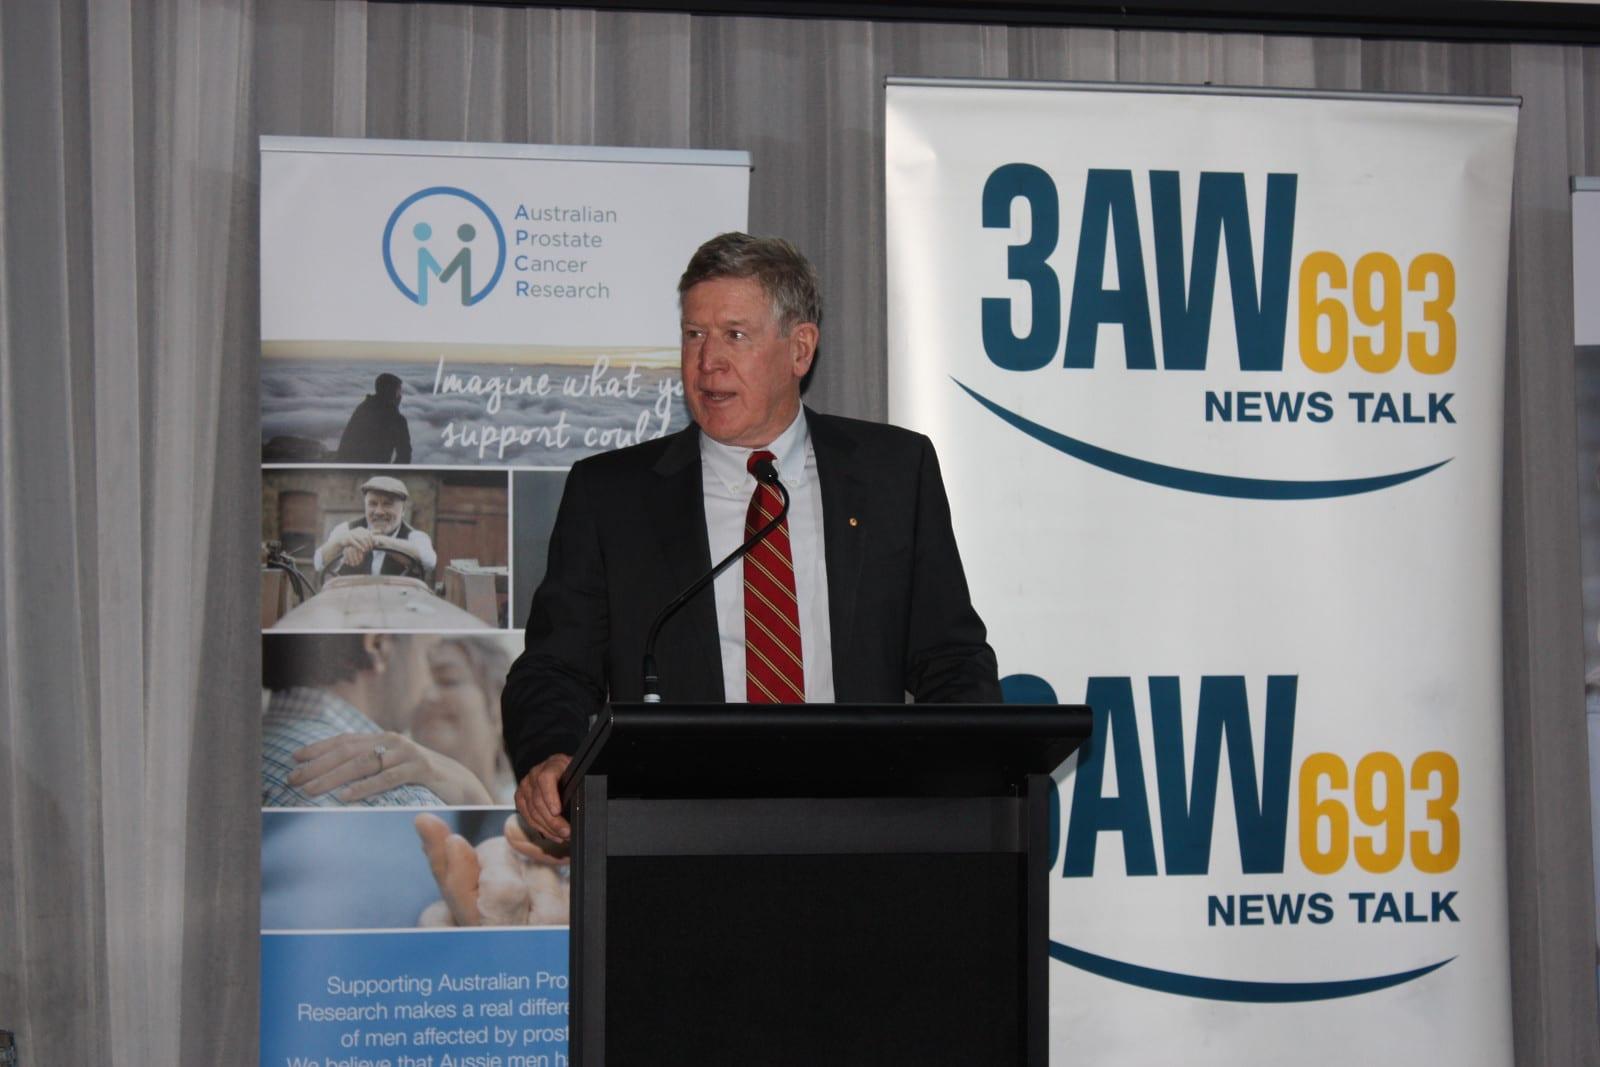 Professor Tony Costello on the Australian Prostate Cancer Research